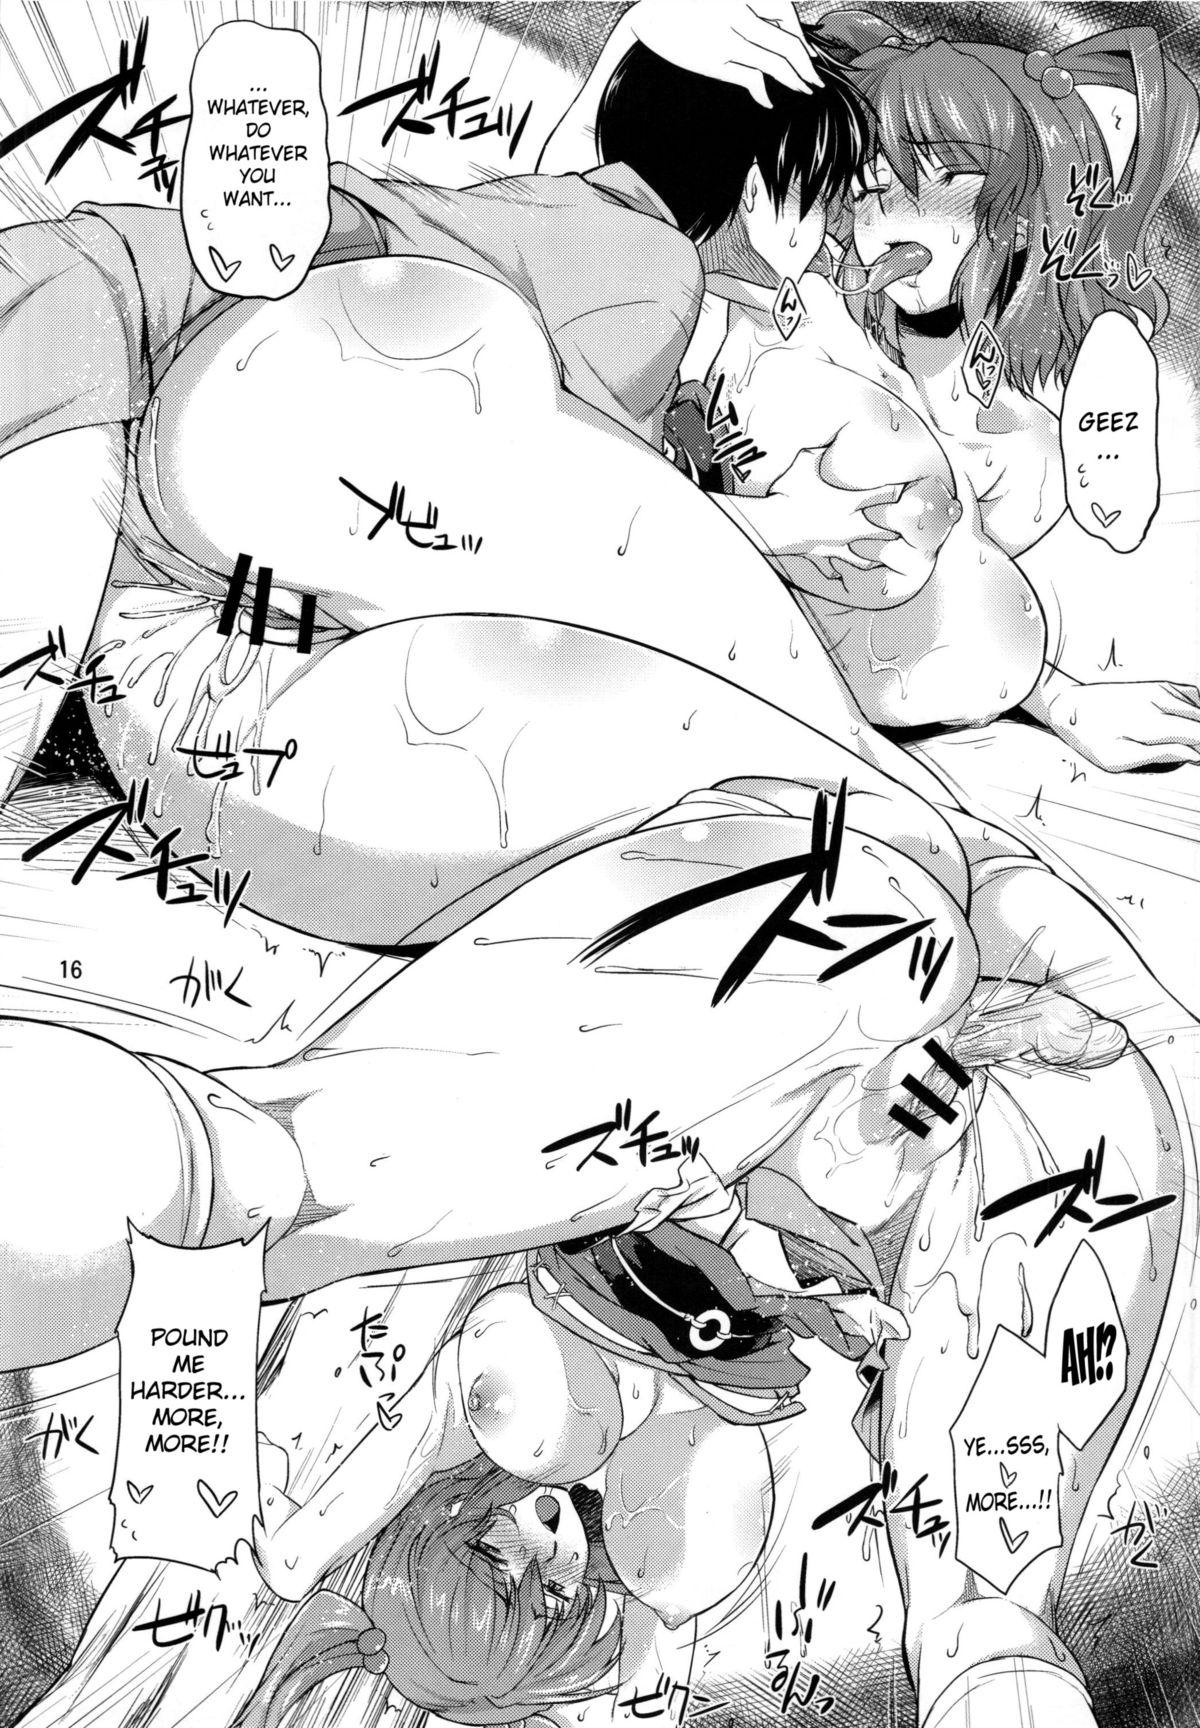 Komacchan no Yokodori 40-man! 14